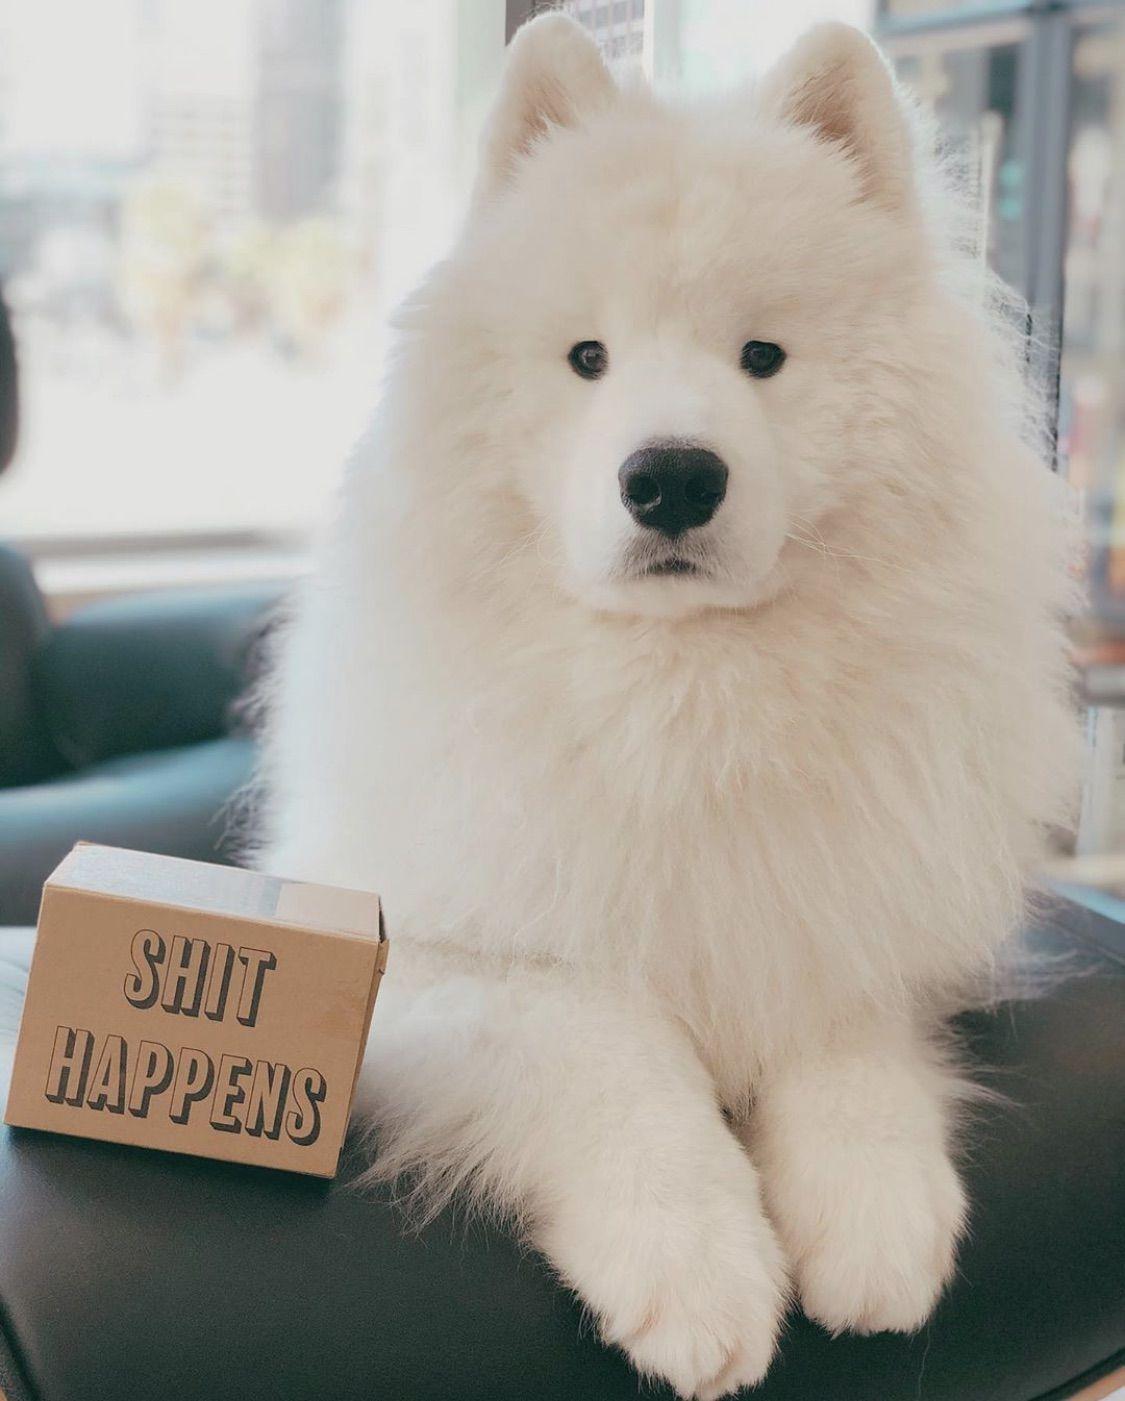 @mickey_flufferton being super fluffy & cute ❤️#poopbags #dogpoopbags #dogsupplies #funny #funnydogs #shithappens #frenchie #frenchbulldog #cutedog #dogsofpinterest #fluffydog #whitedog #samoyed #samoyeddog